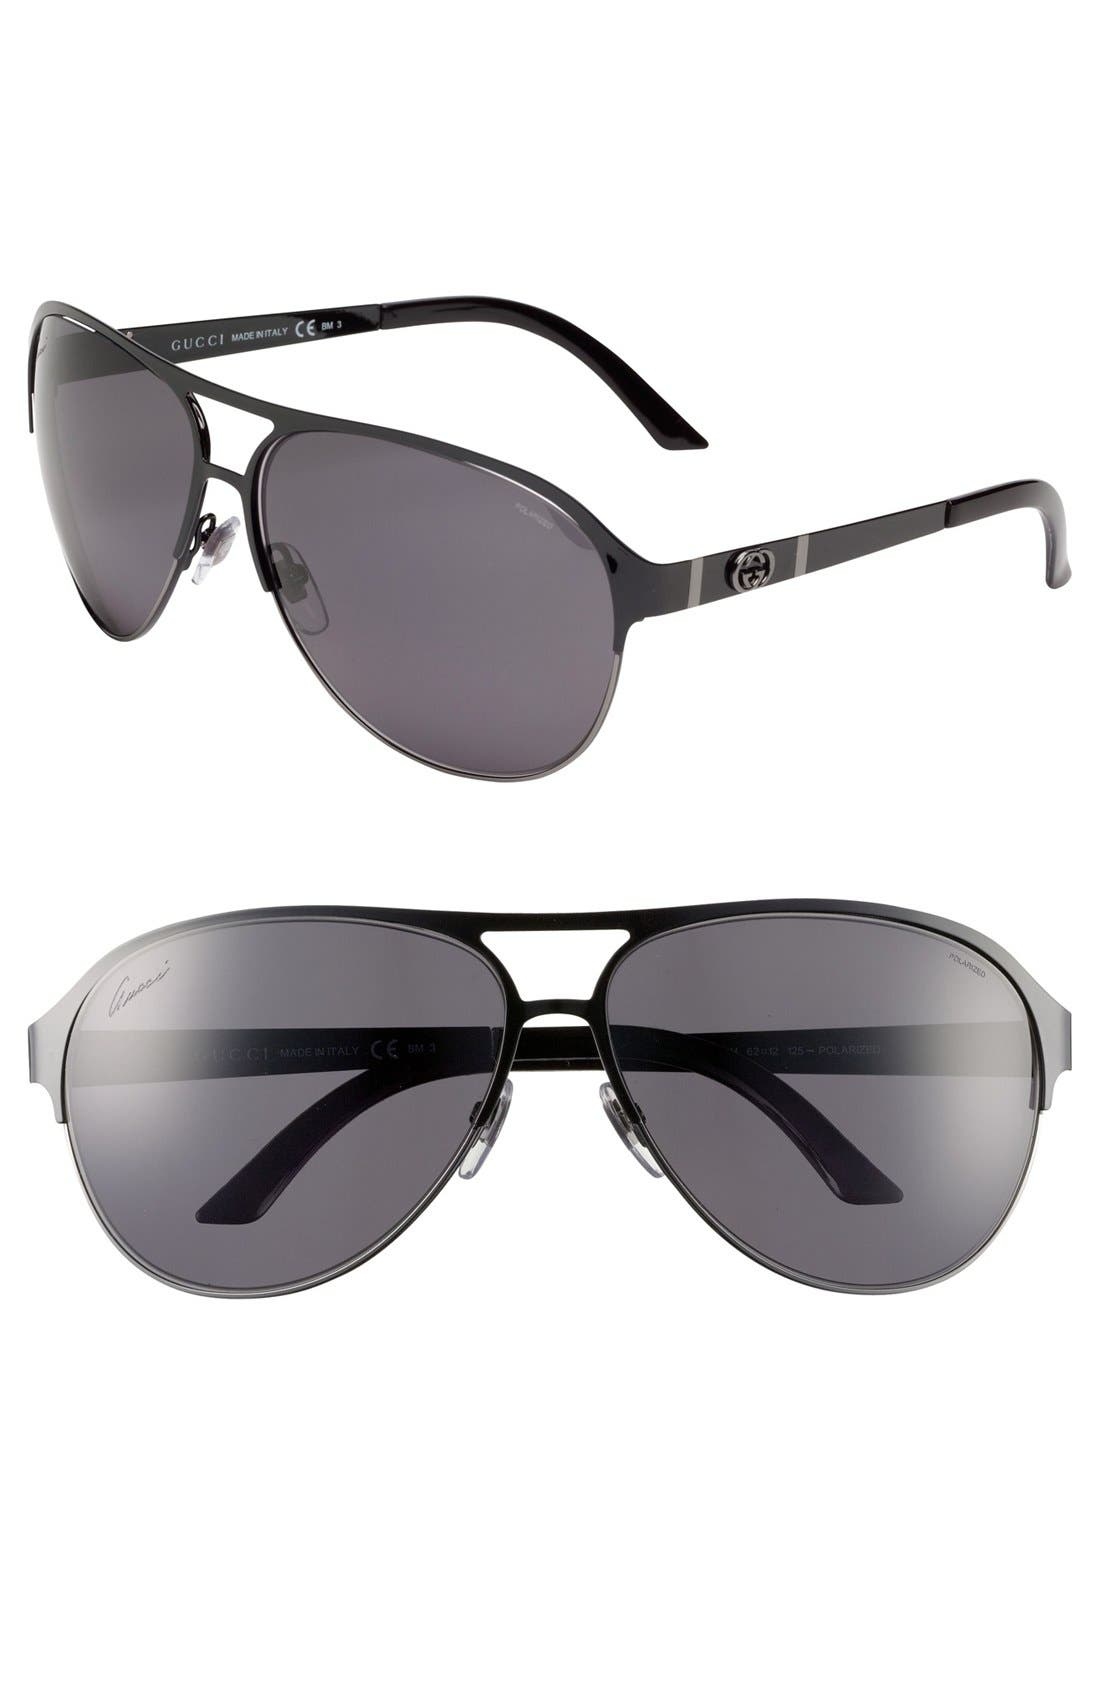 Main Image - Gucci 62mm Polarized Metal Aviator Sunglasses